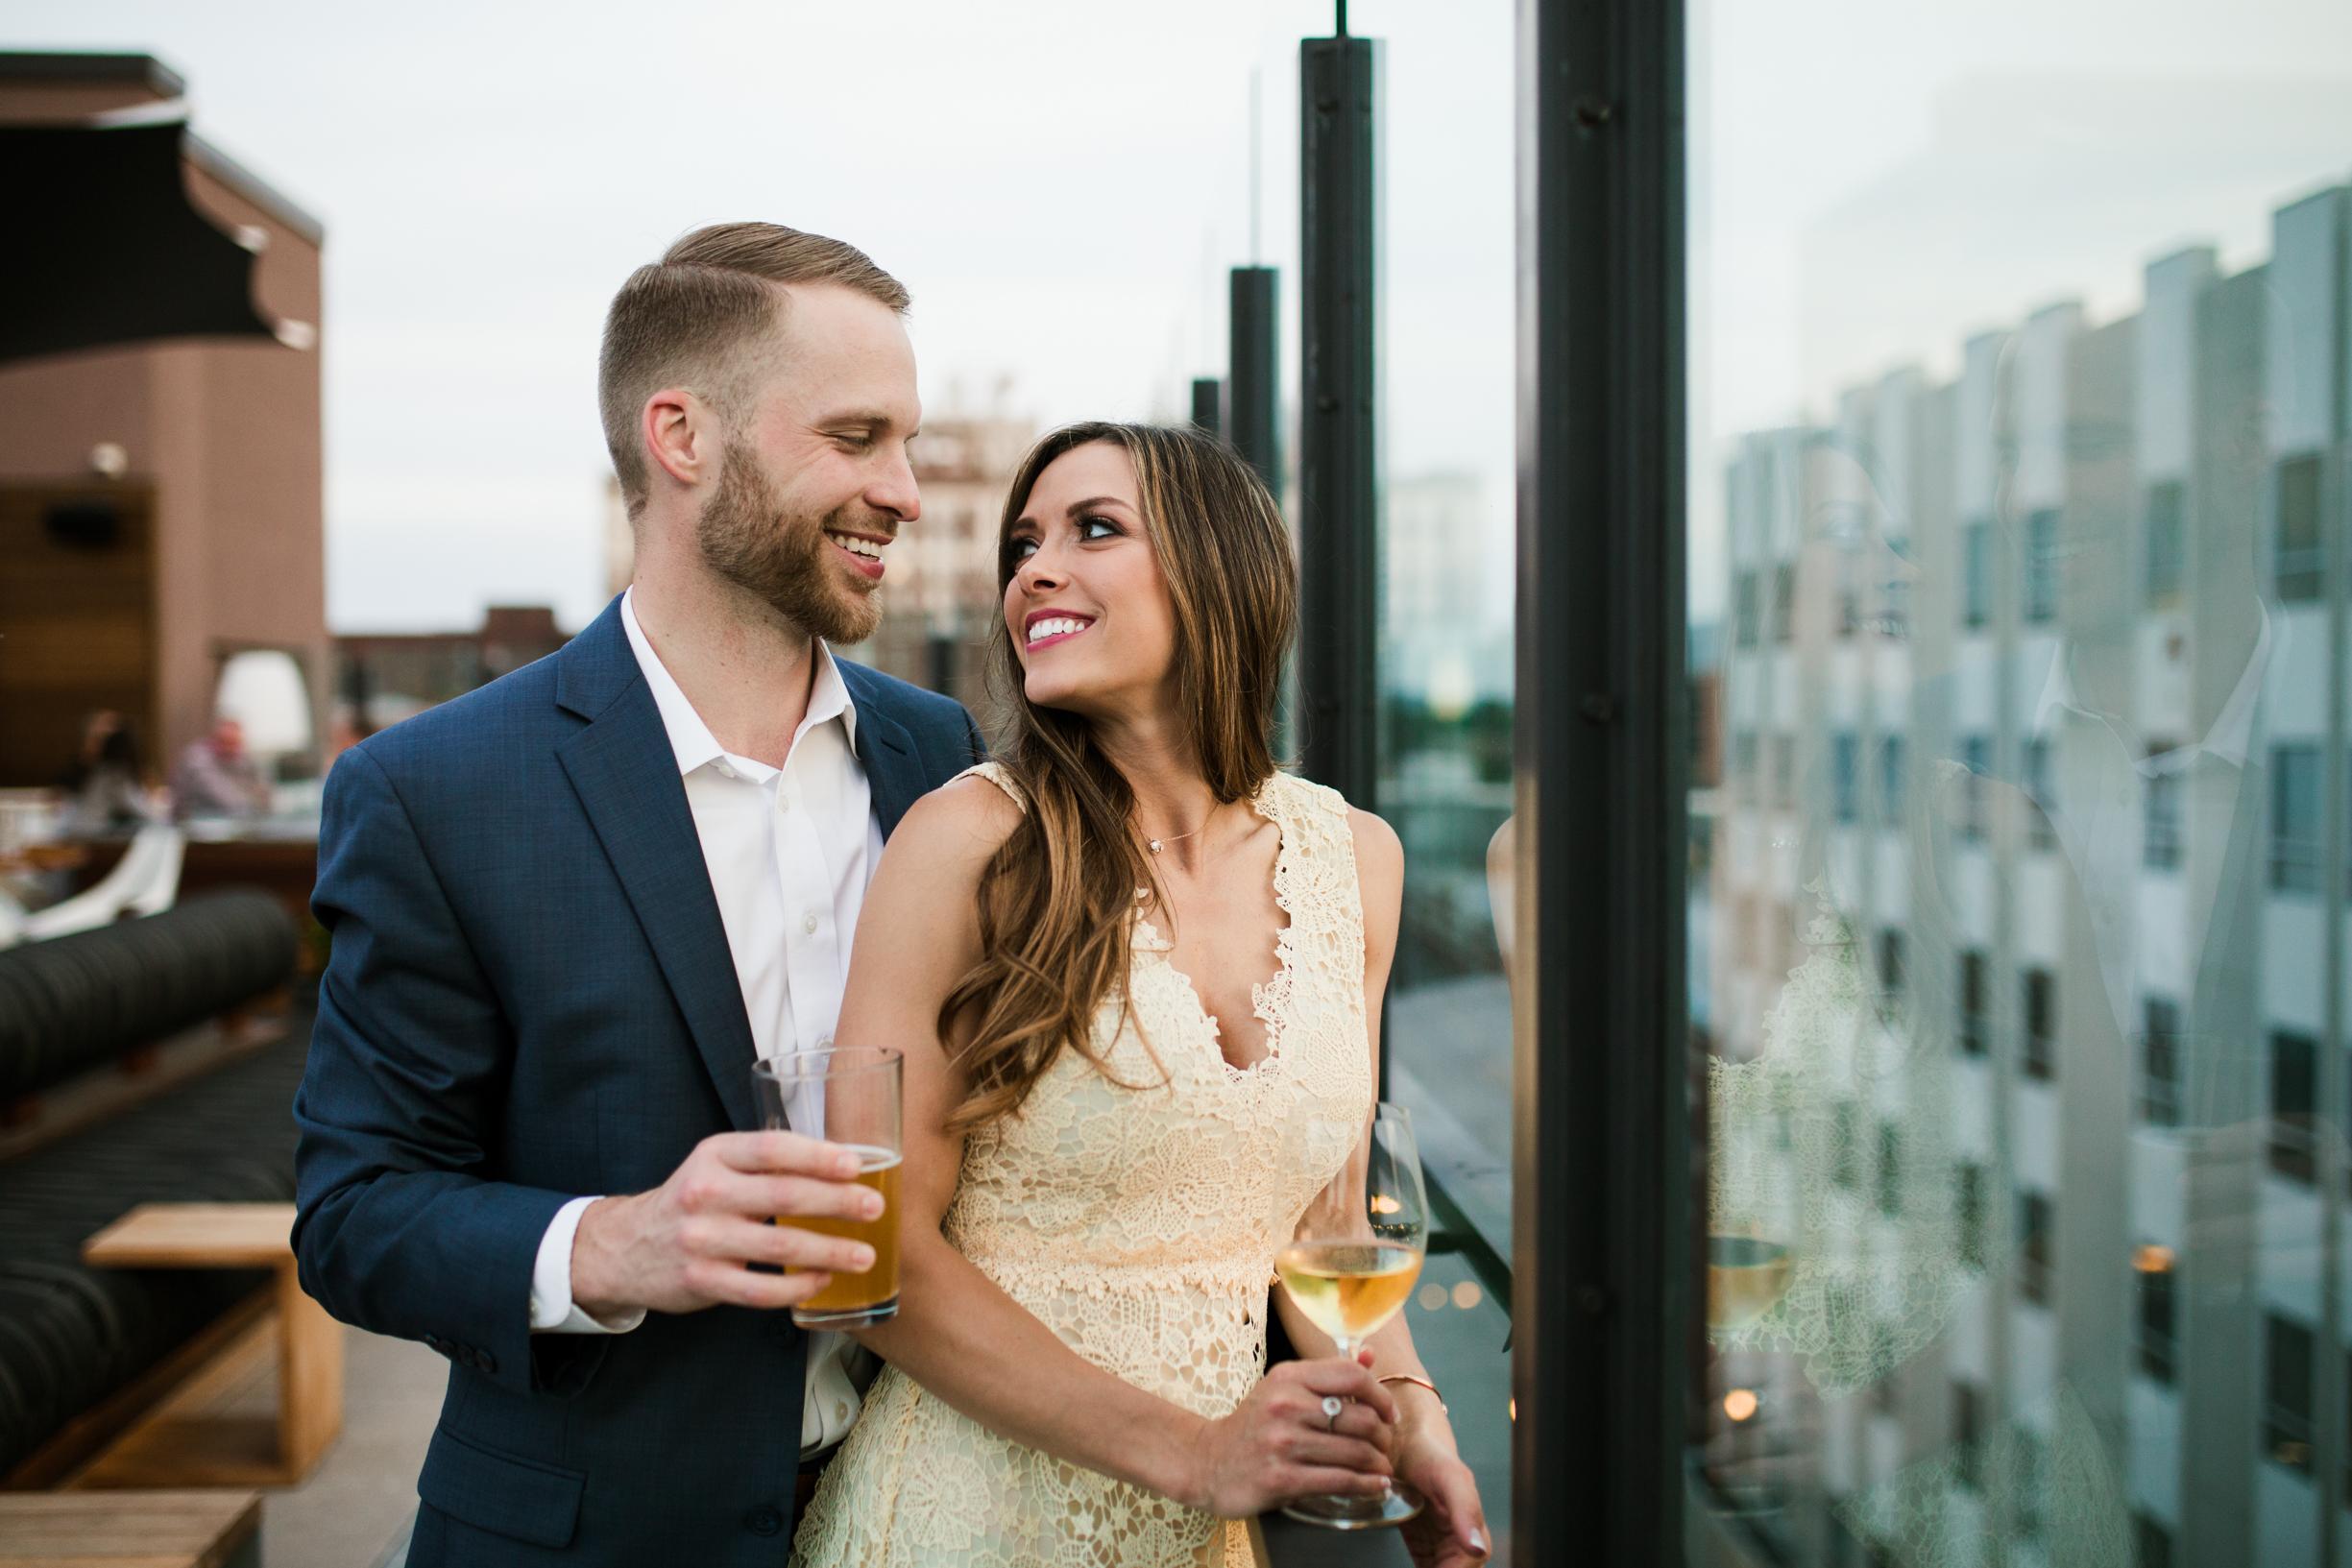 Victoria & Chad Engagement 2018 Crystal Ludwick Photo Louisville Kentucky Wedding Photographer WEBSITE (17 of 48).jpg